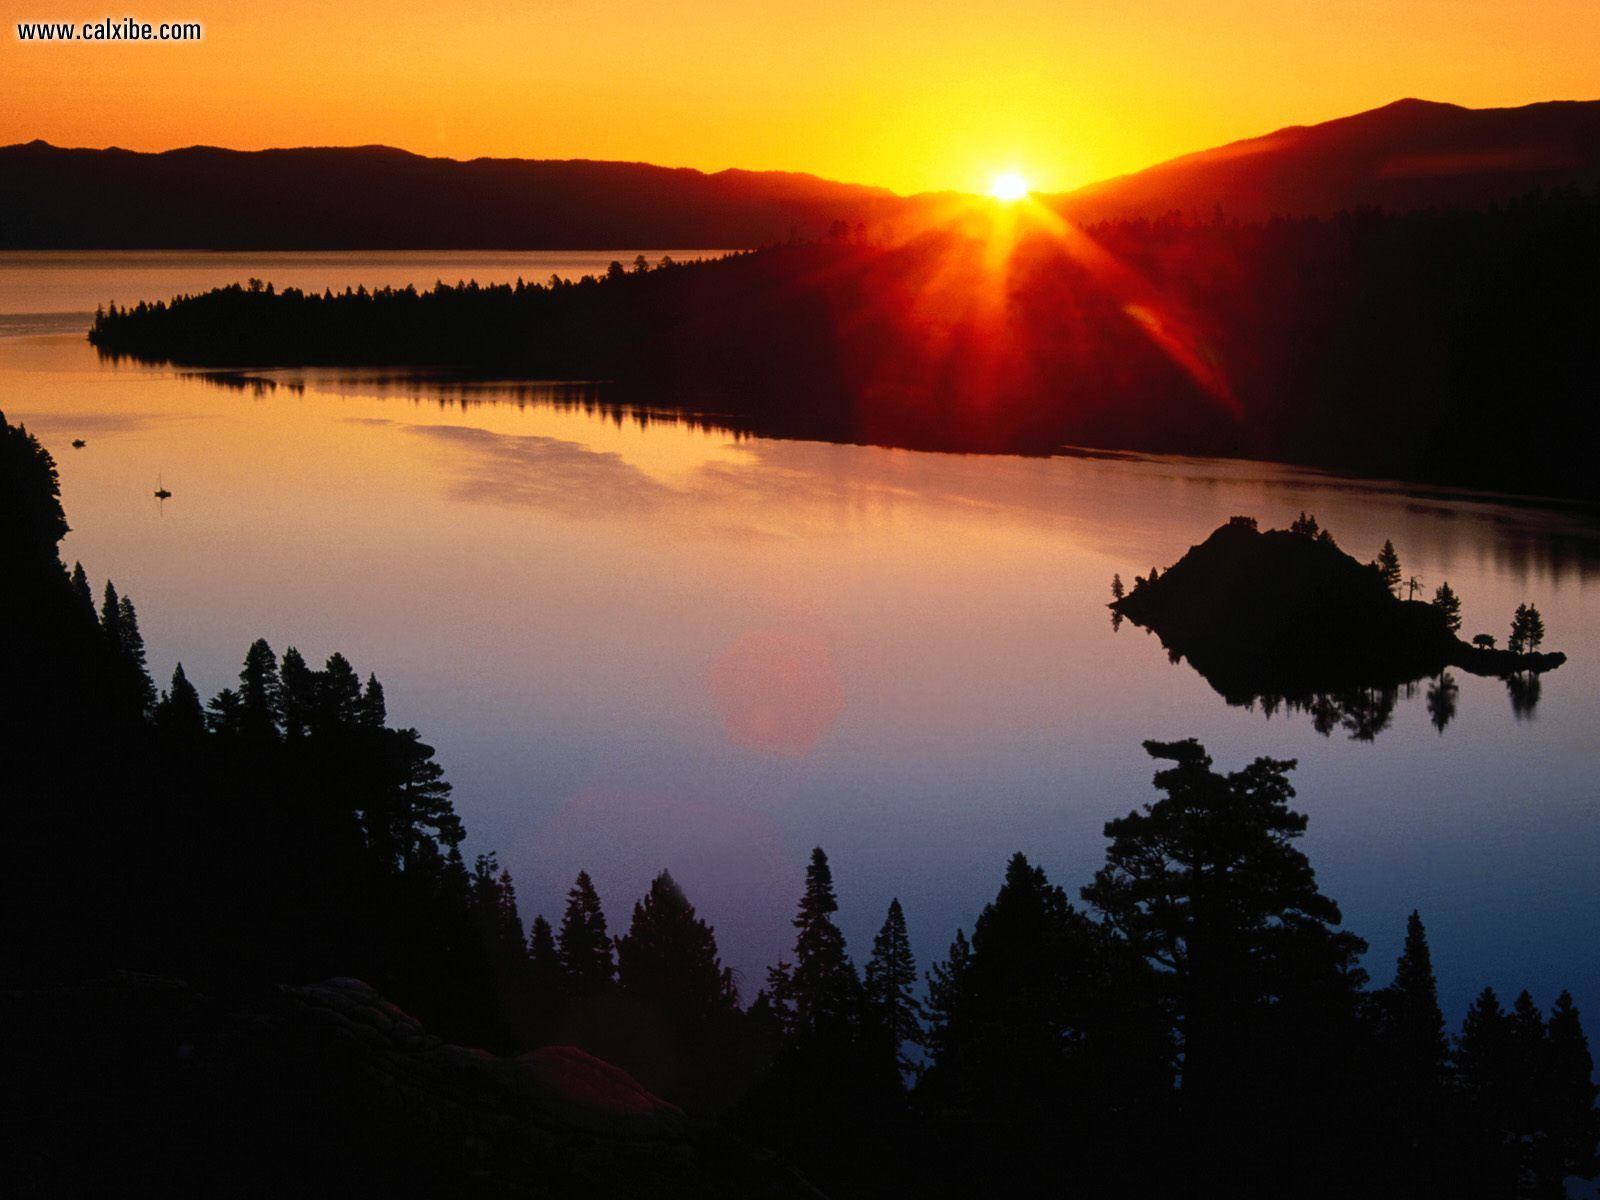 Lake tahoe sunset travel channel pinterest - Beautiful Lake Tahoe